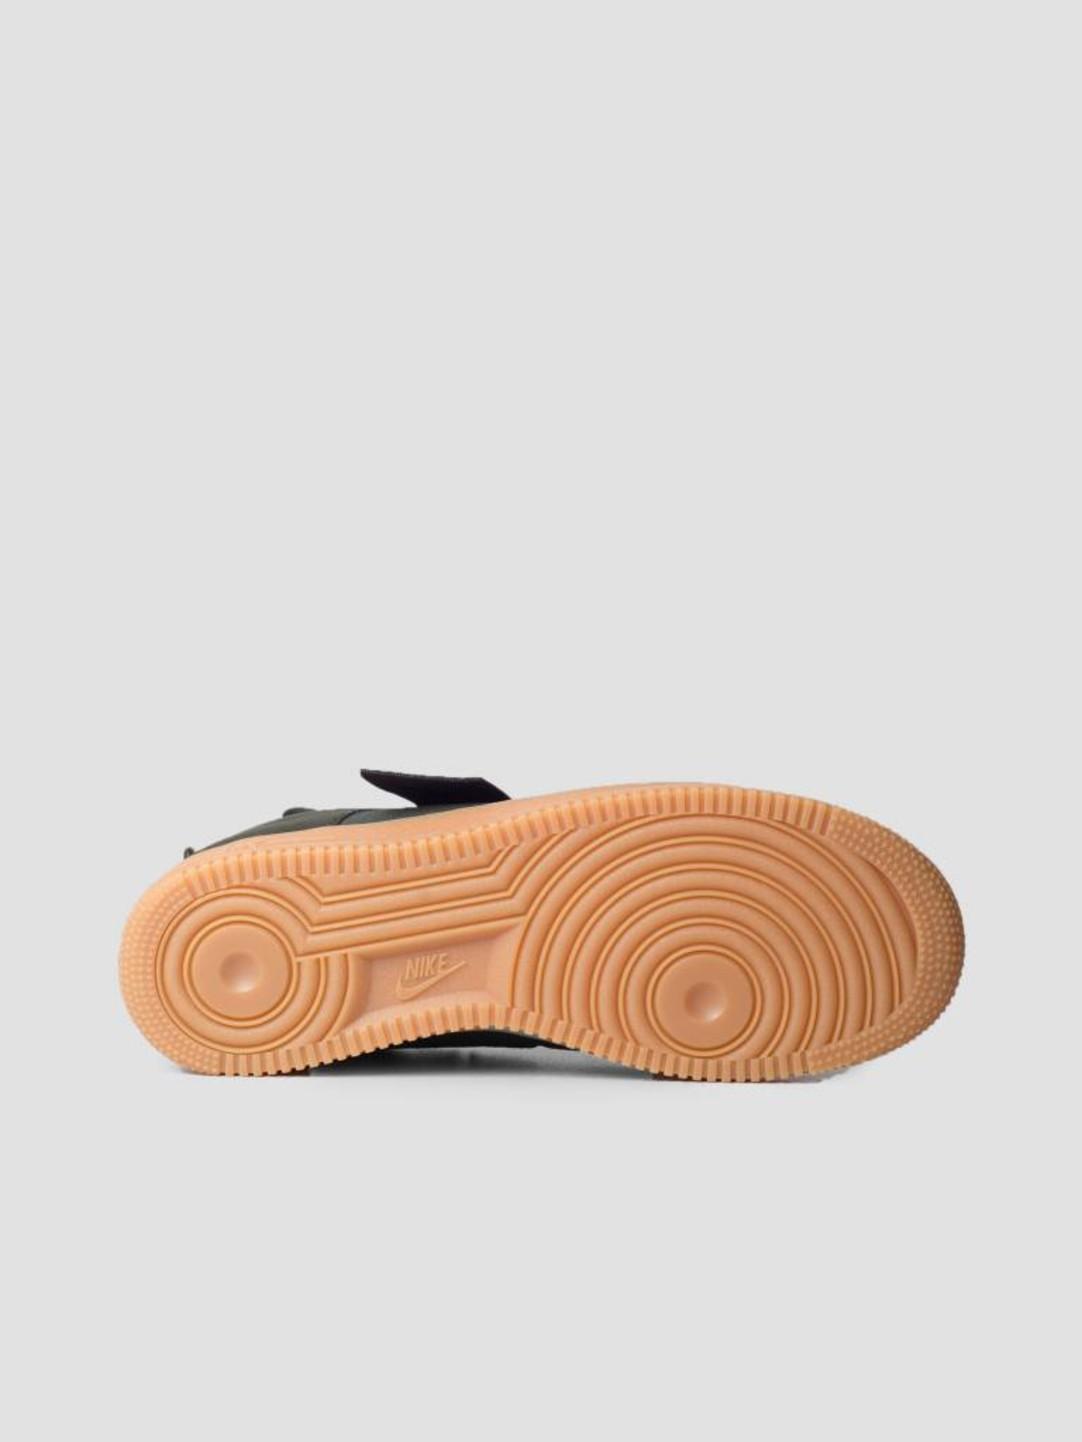 Nike Nike Air Force 1 Utility Sequoia Black Gum Med Brown Ao1531-300